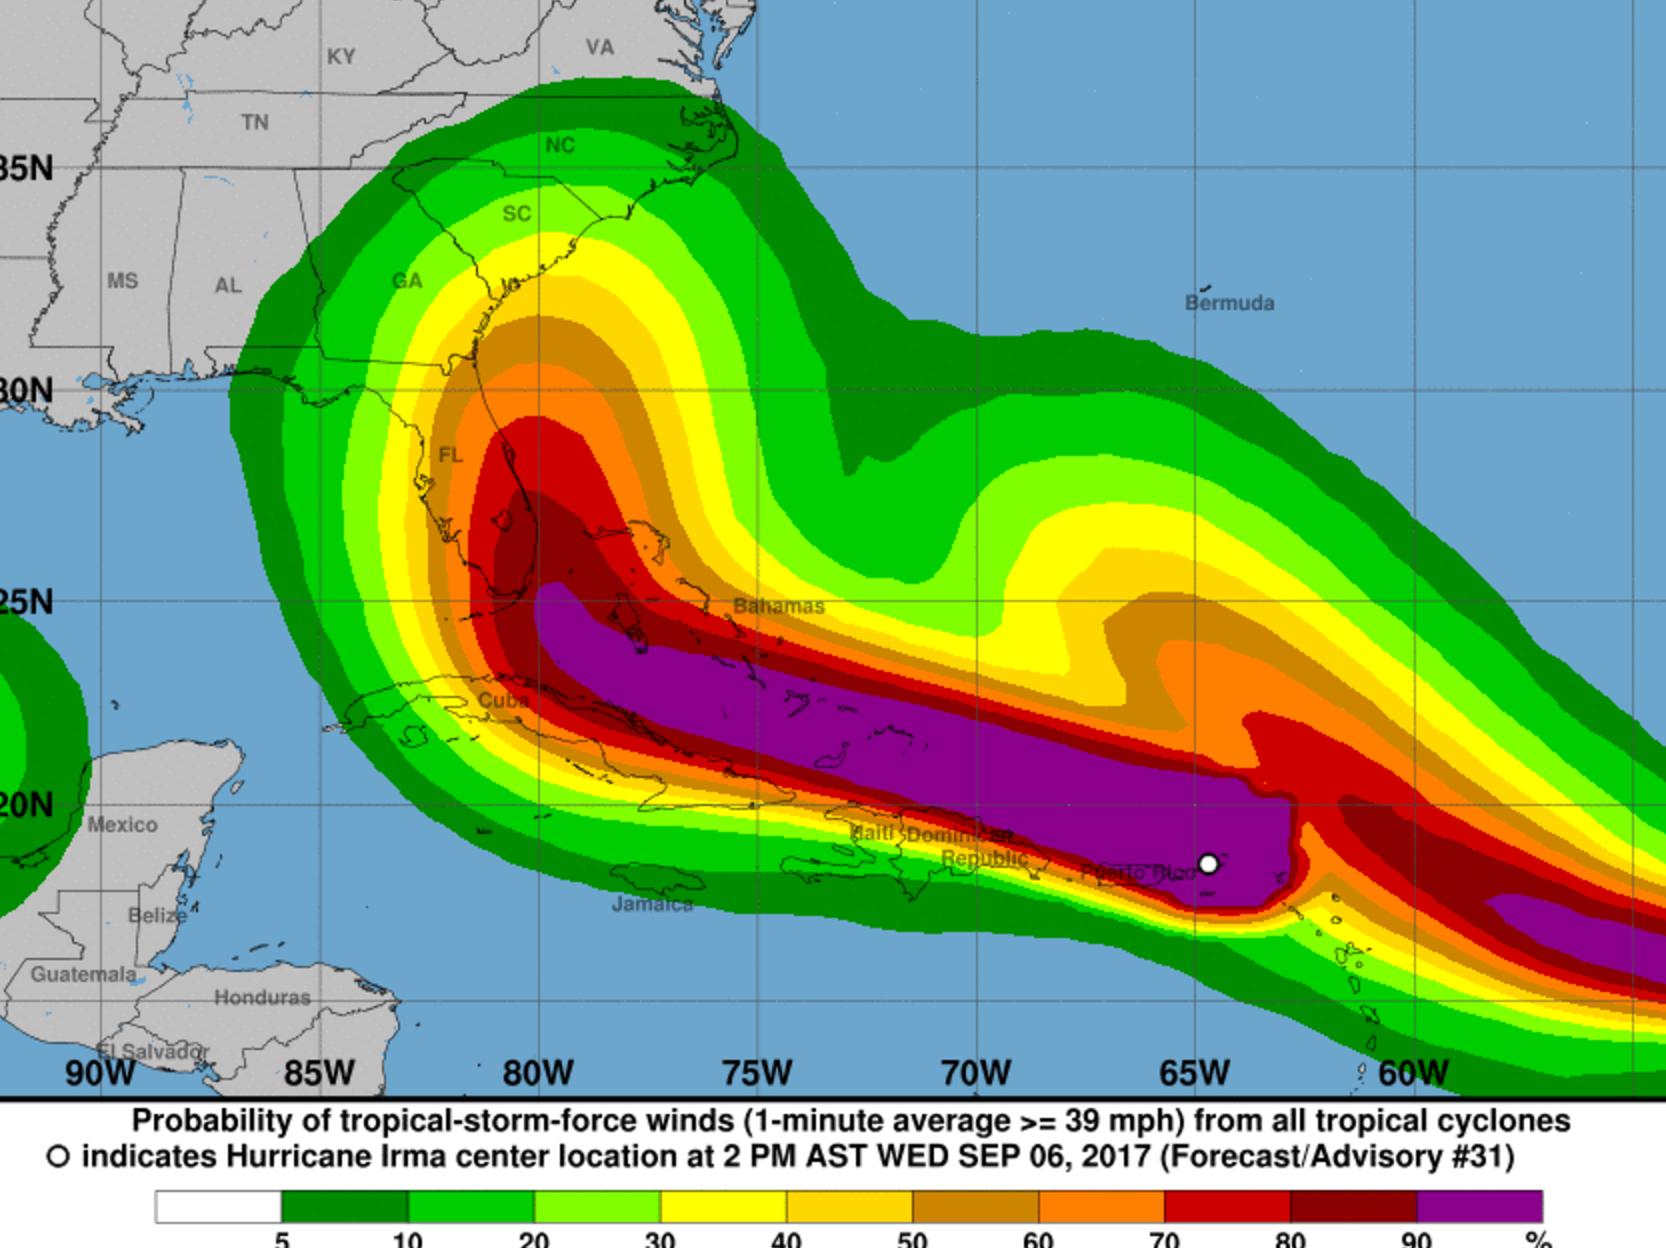 St. Lucie County Hurricane Irma Update Wednesday, Sept. 6